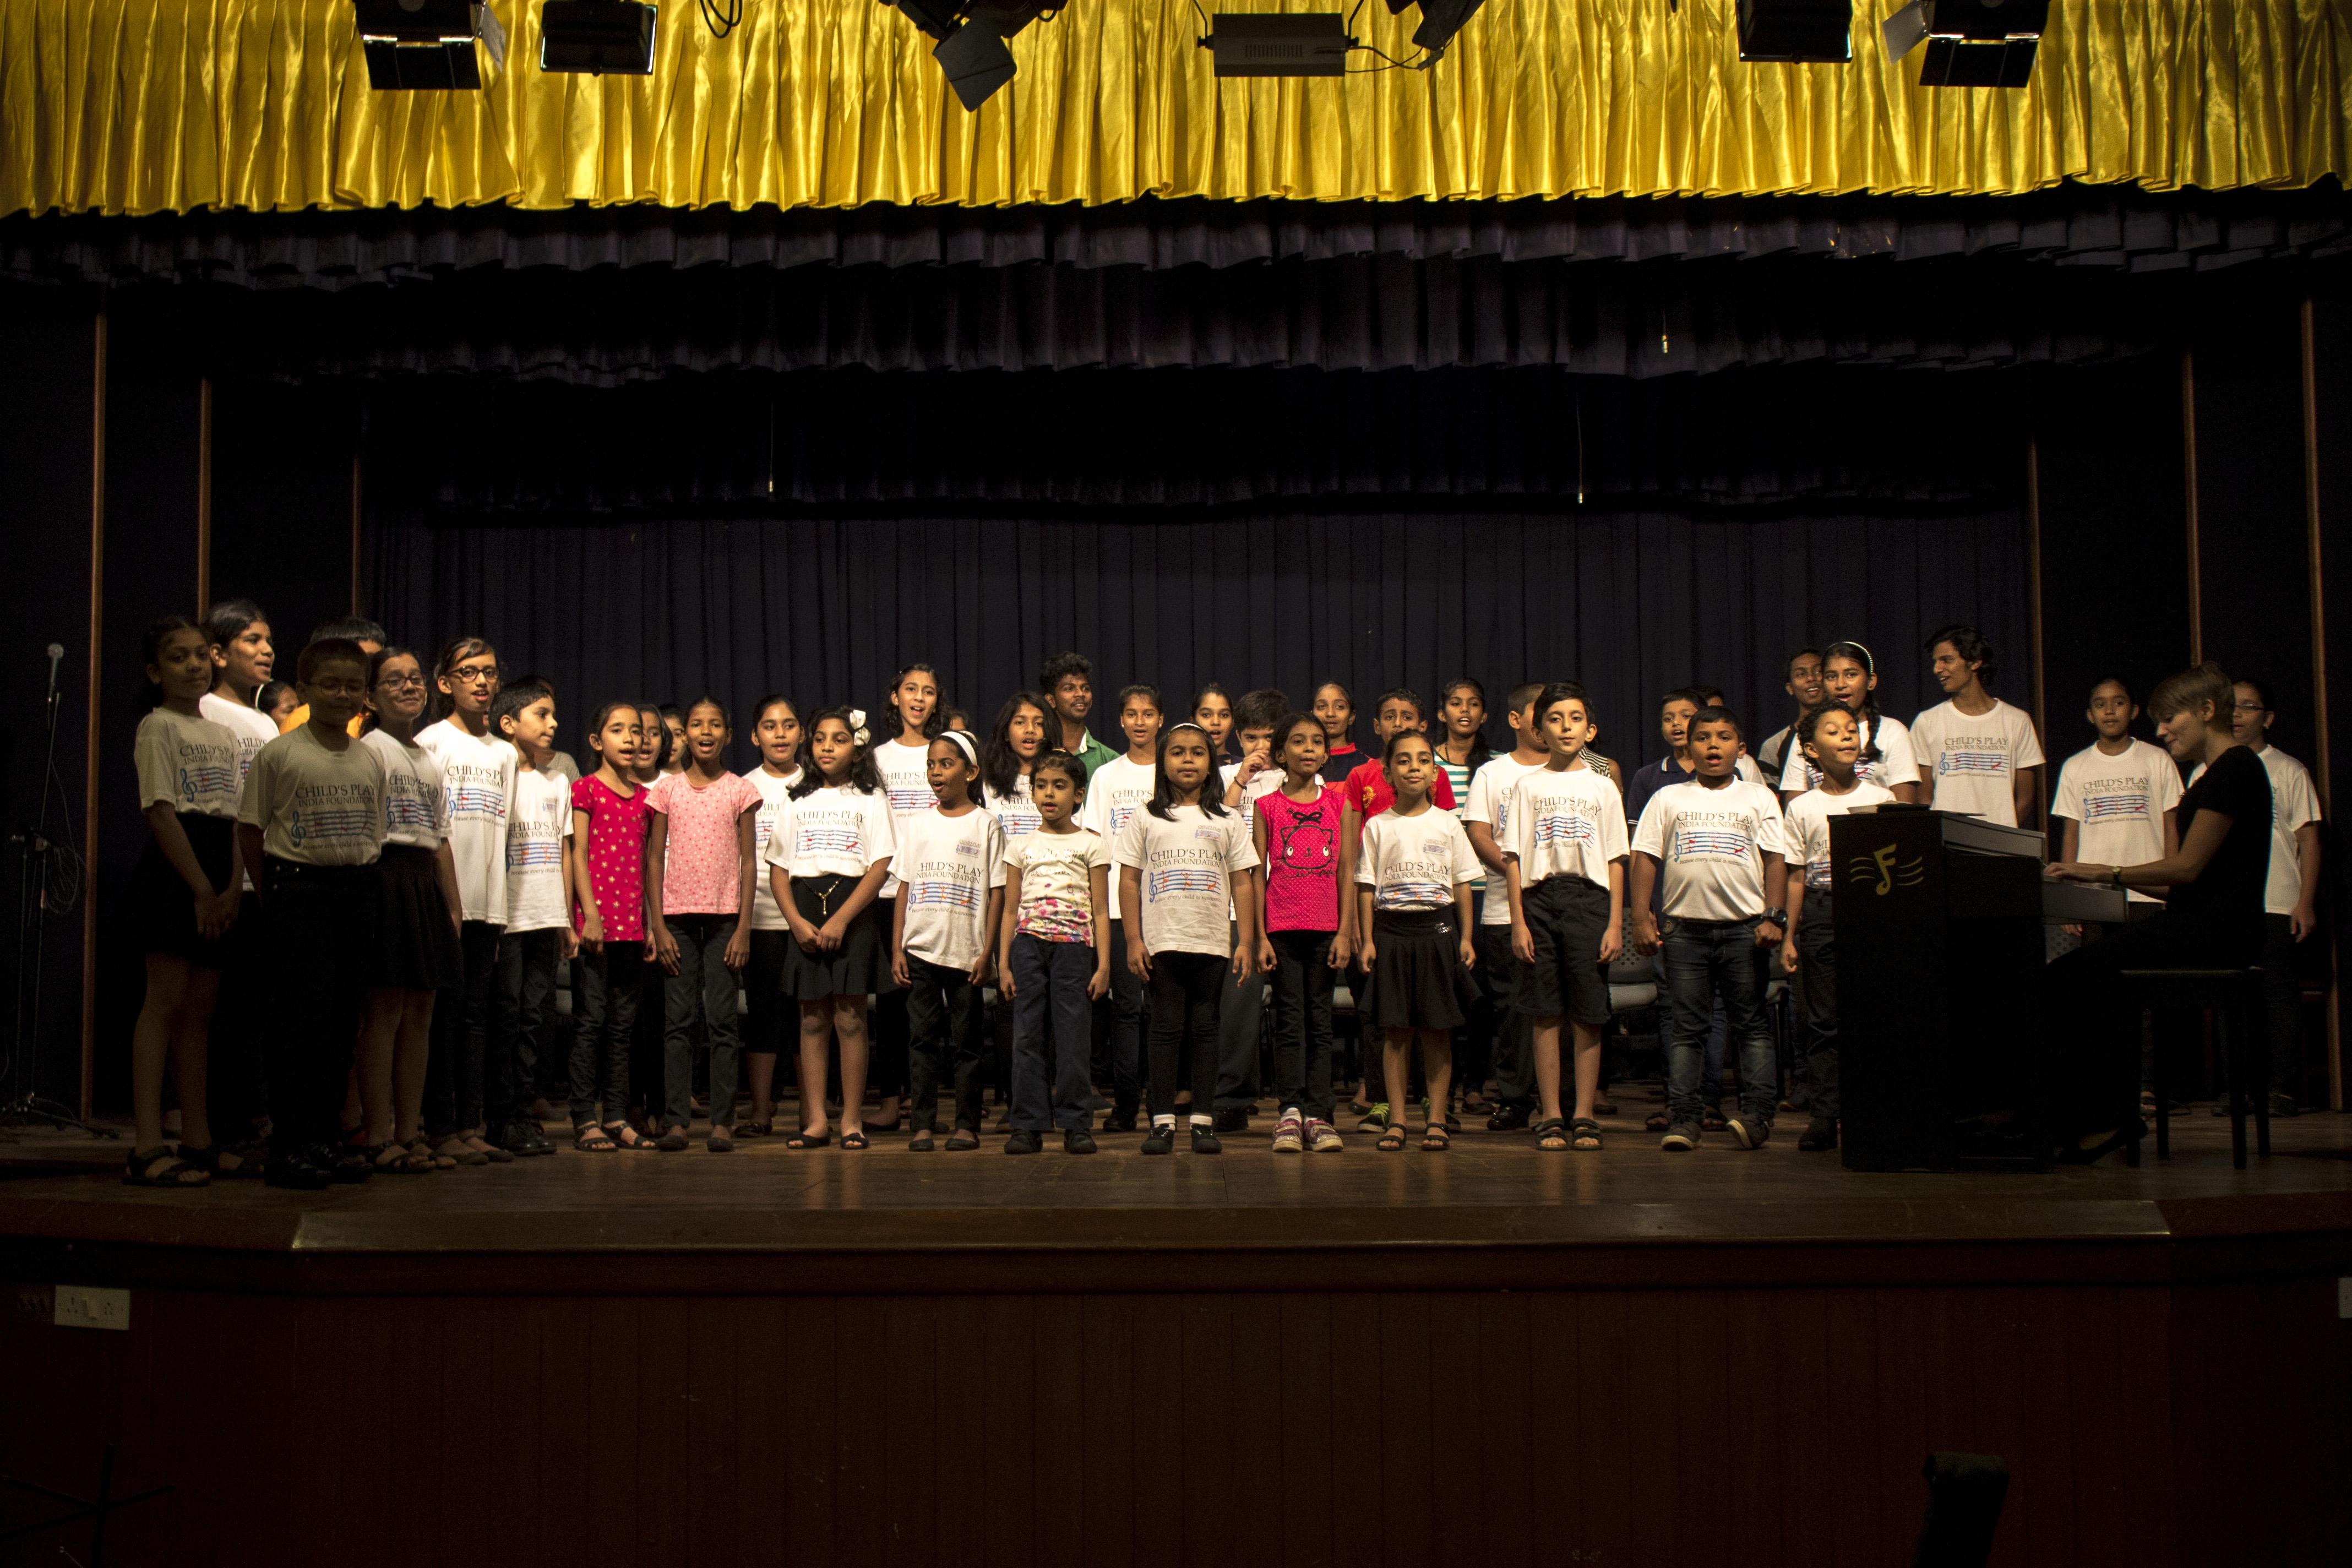 Children's choir rehearsing